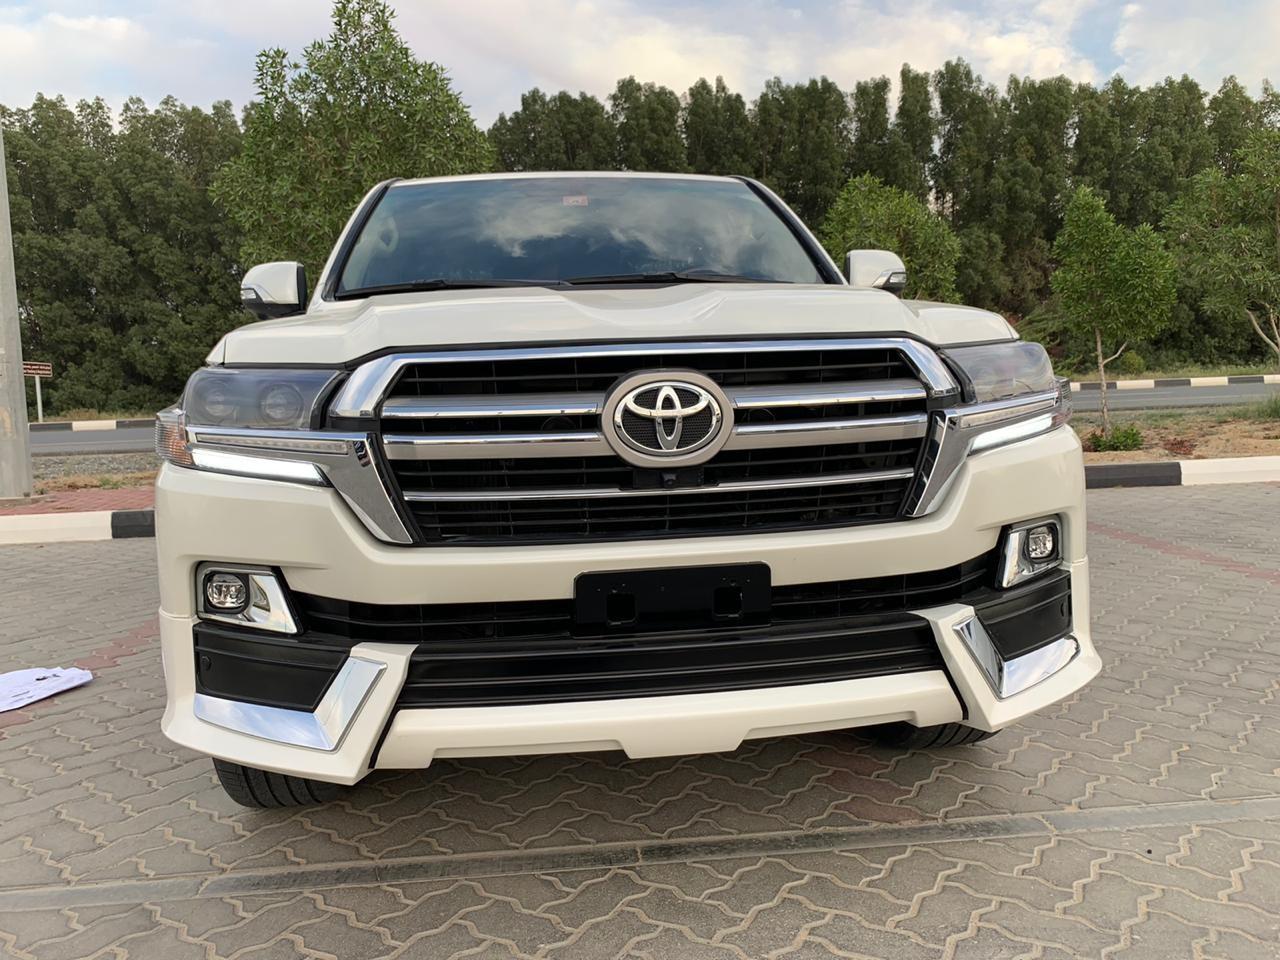 Kekurangan Toyota Land Cruiser 2009 Murah Berkualitas